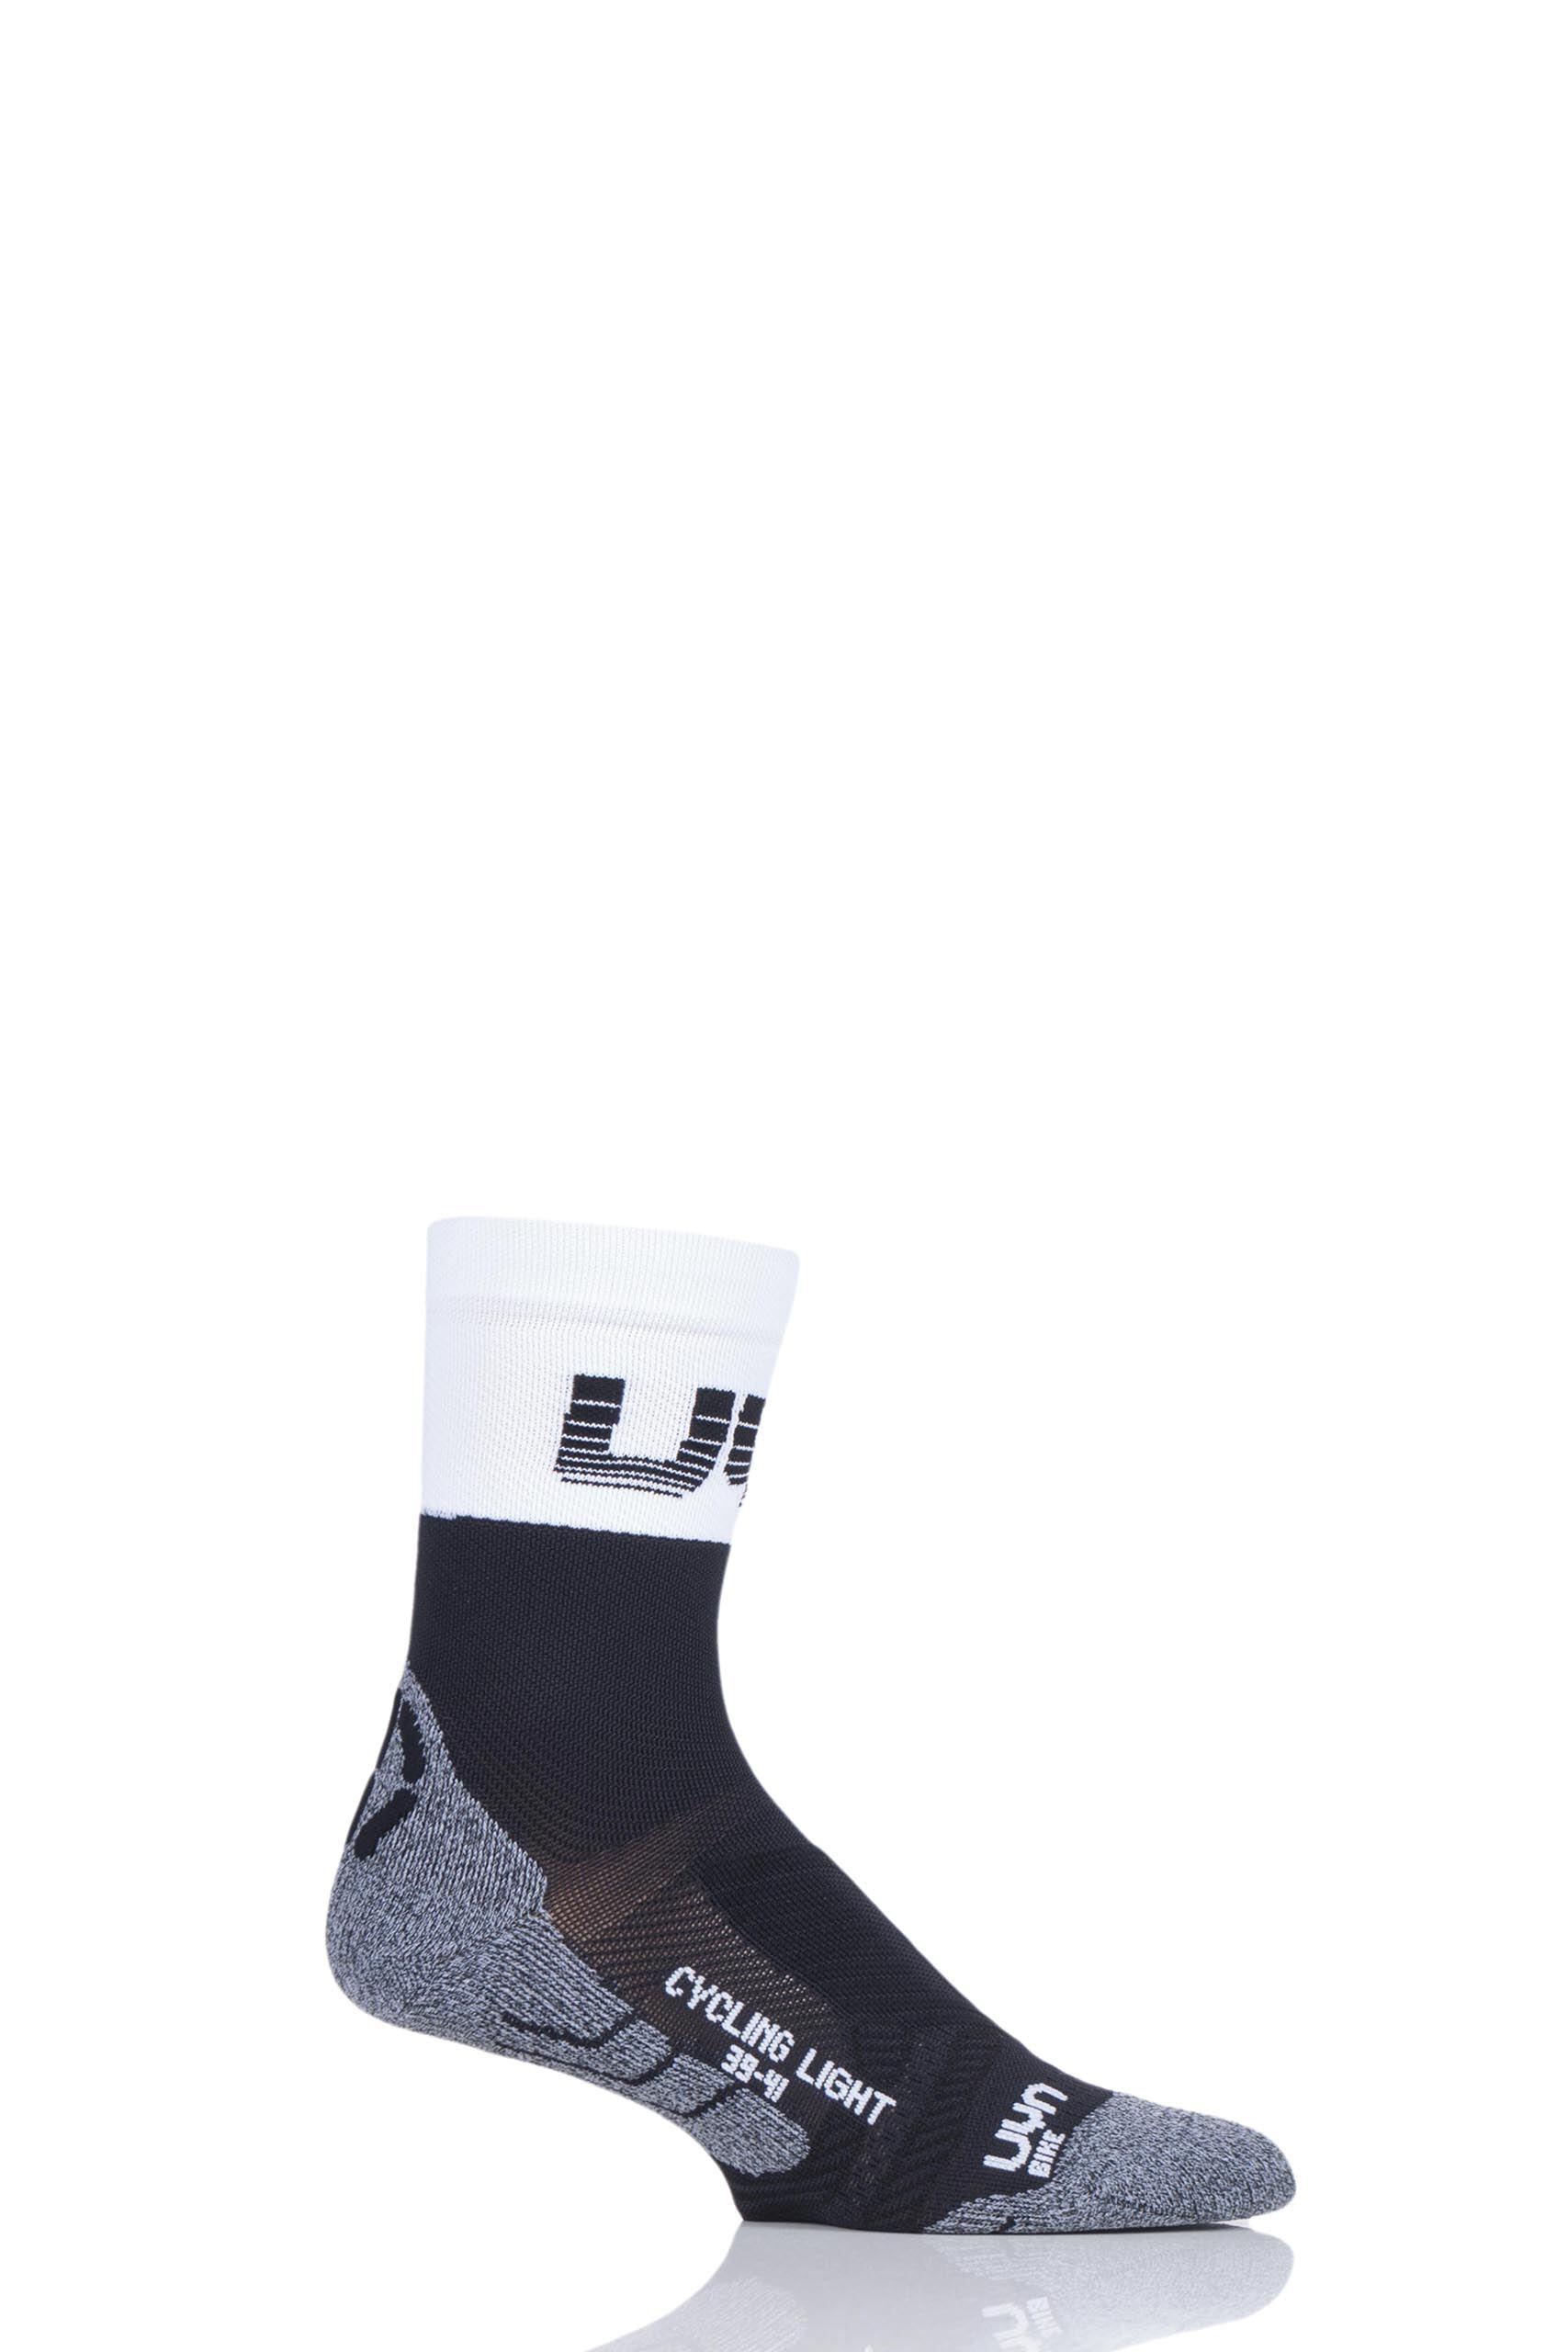 Image of 1 Pair Black Cycling Light Weight Socks Men's 8-9.5 Mens - UYN